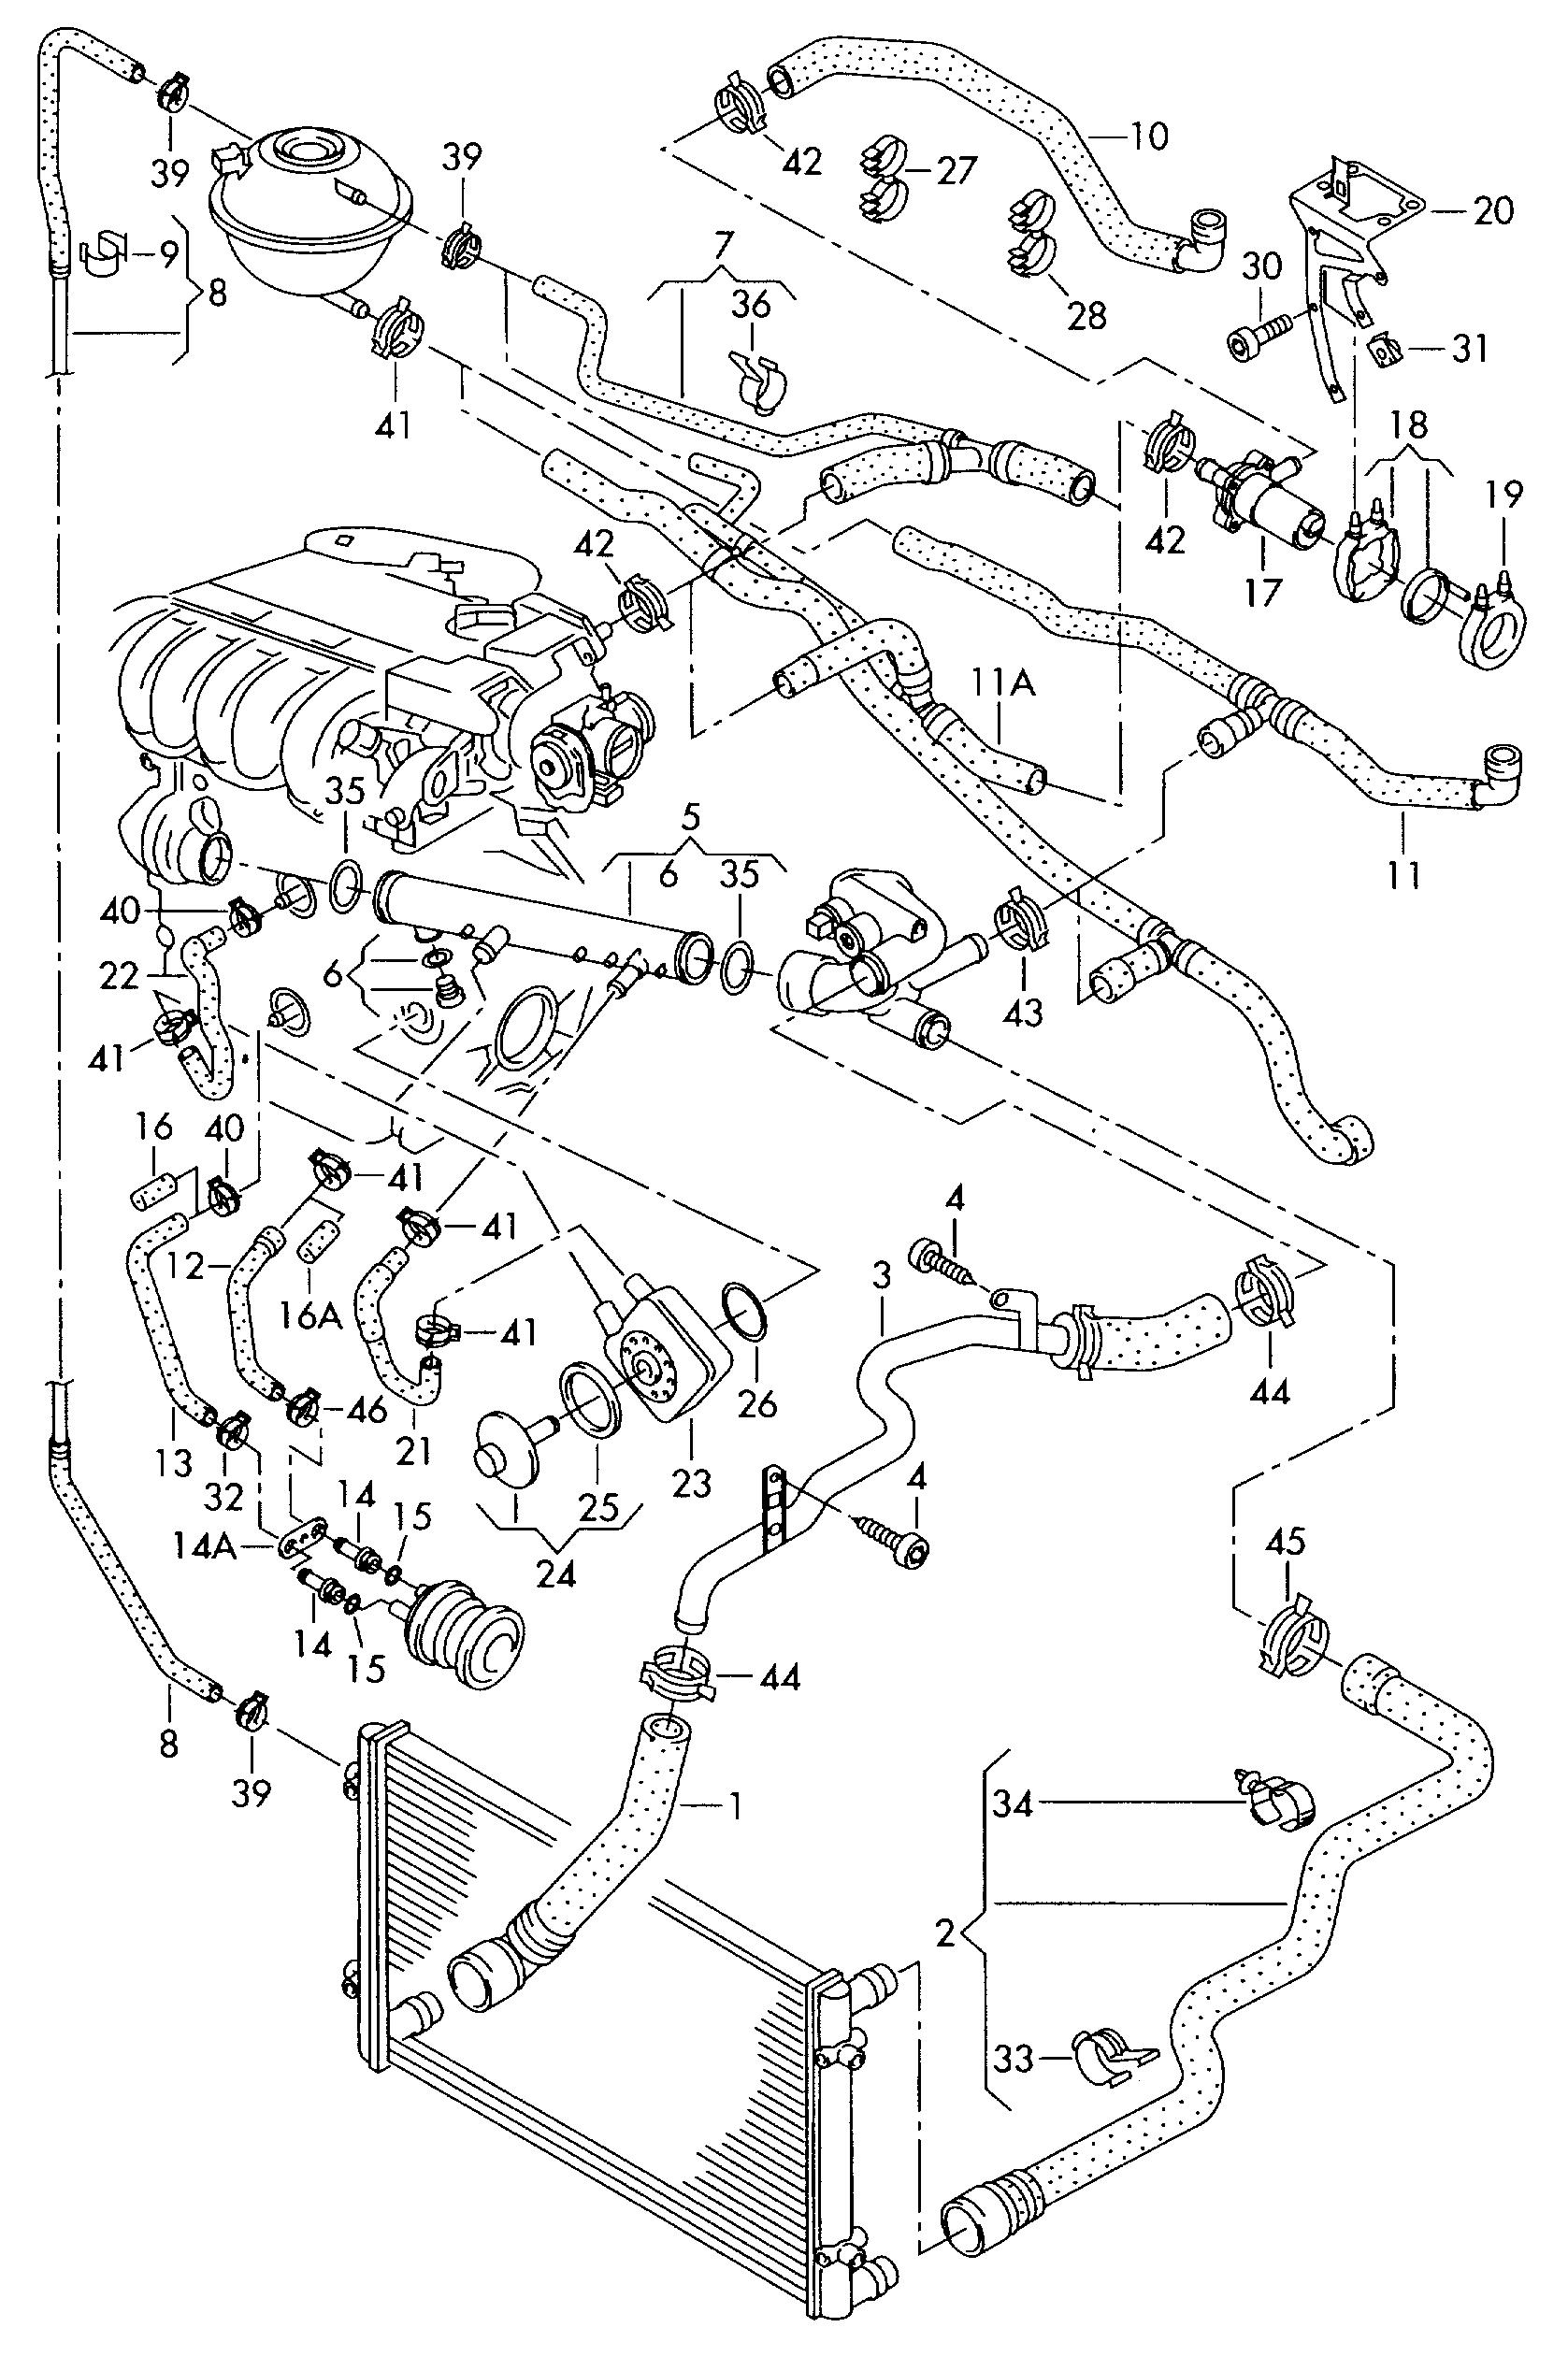 2012 Vw Touareg Engine Diagram Wiring Diagram Blame Fast Blame Fast Lastanzadeltempo It